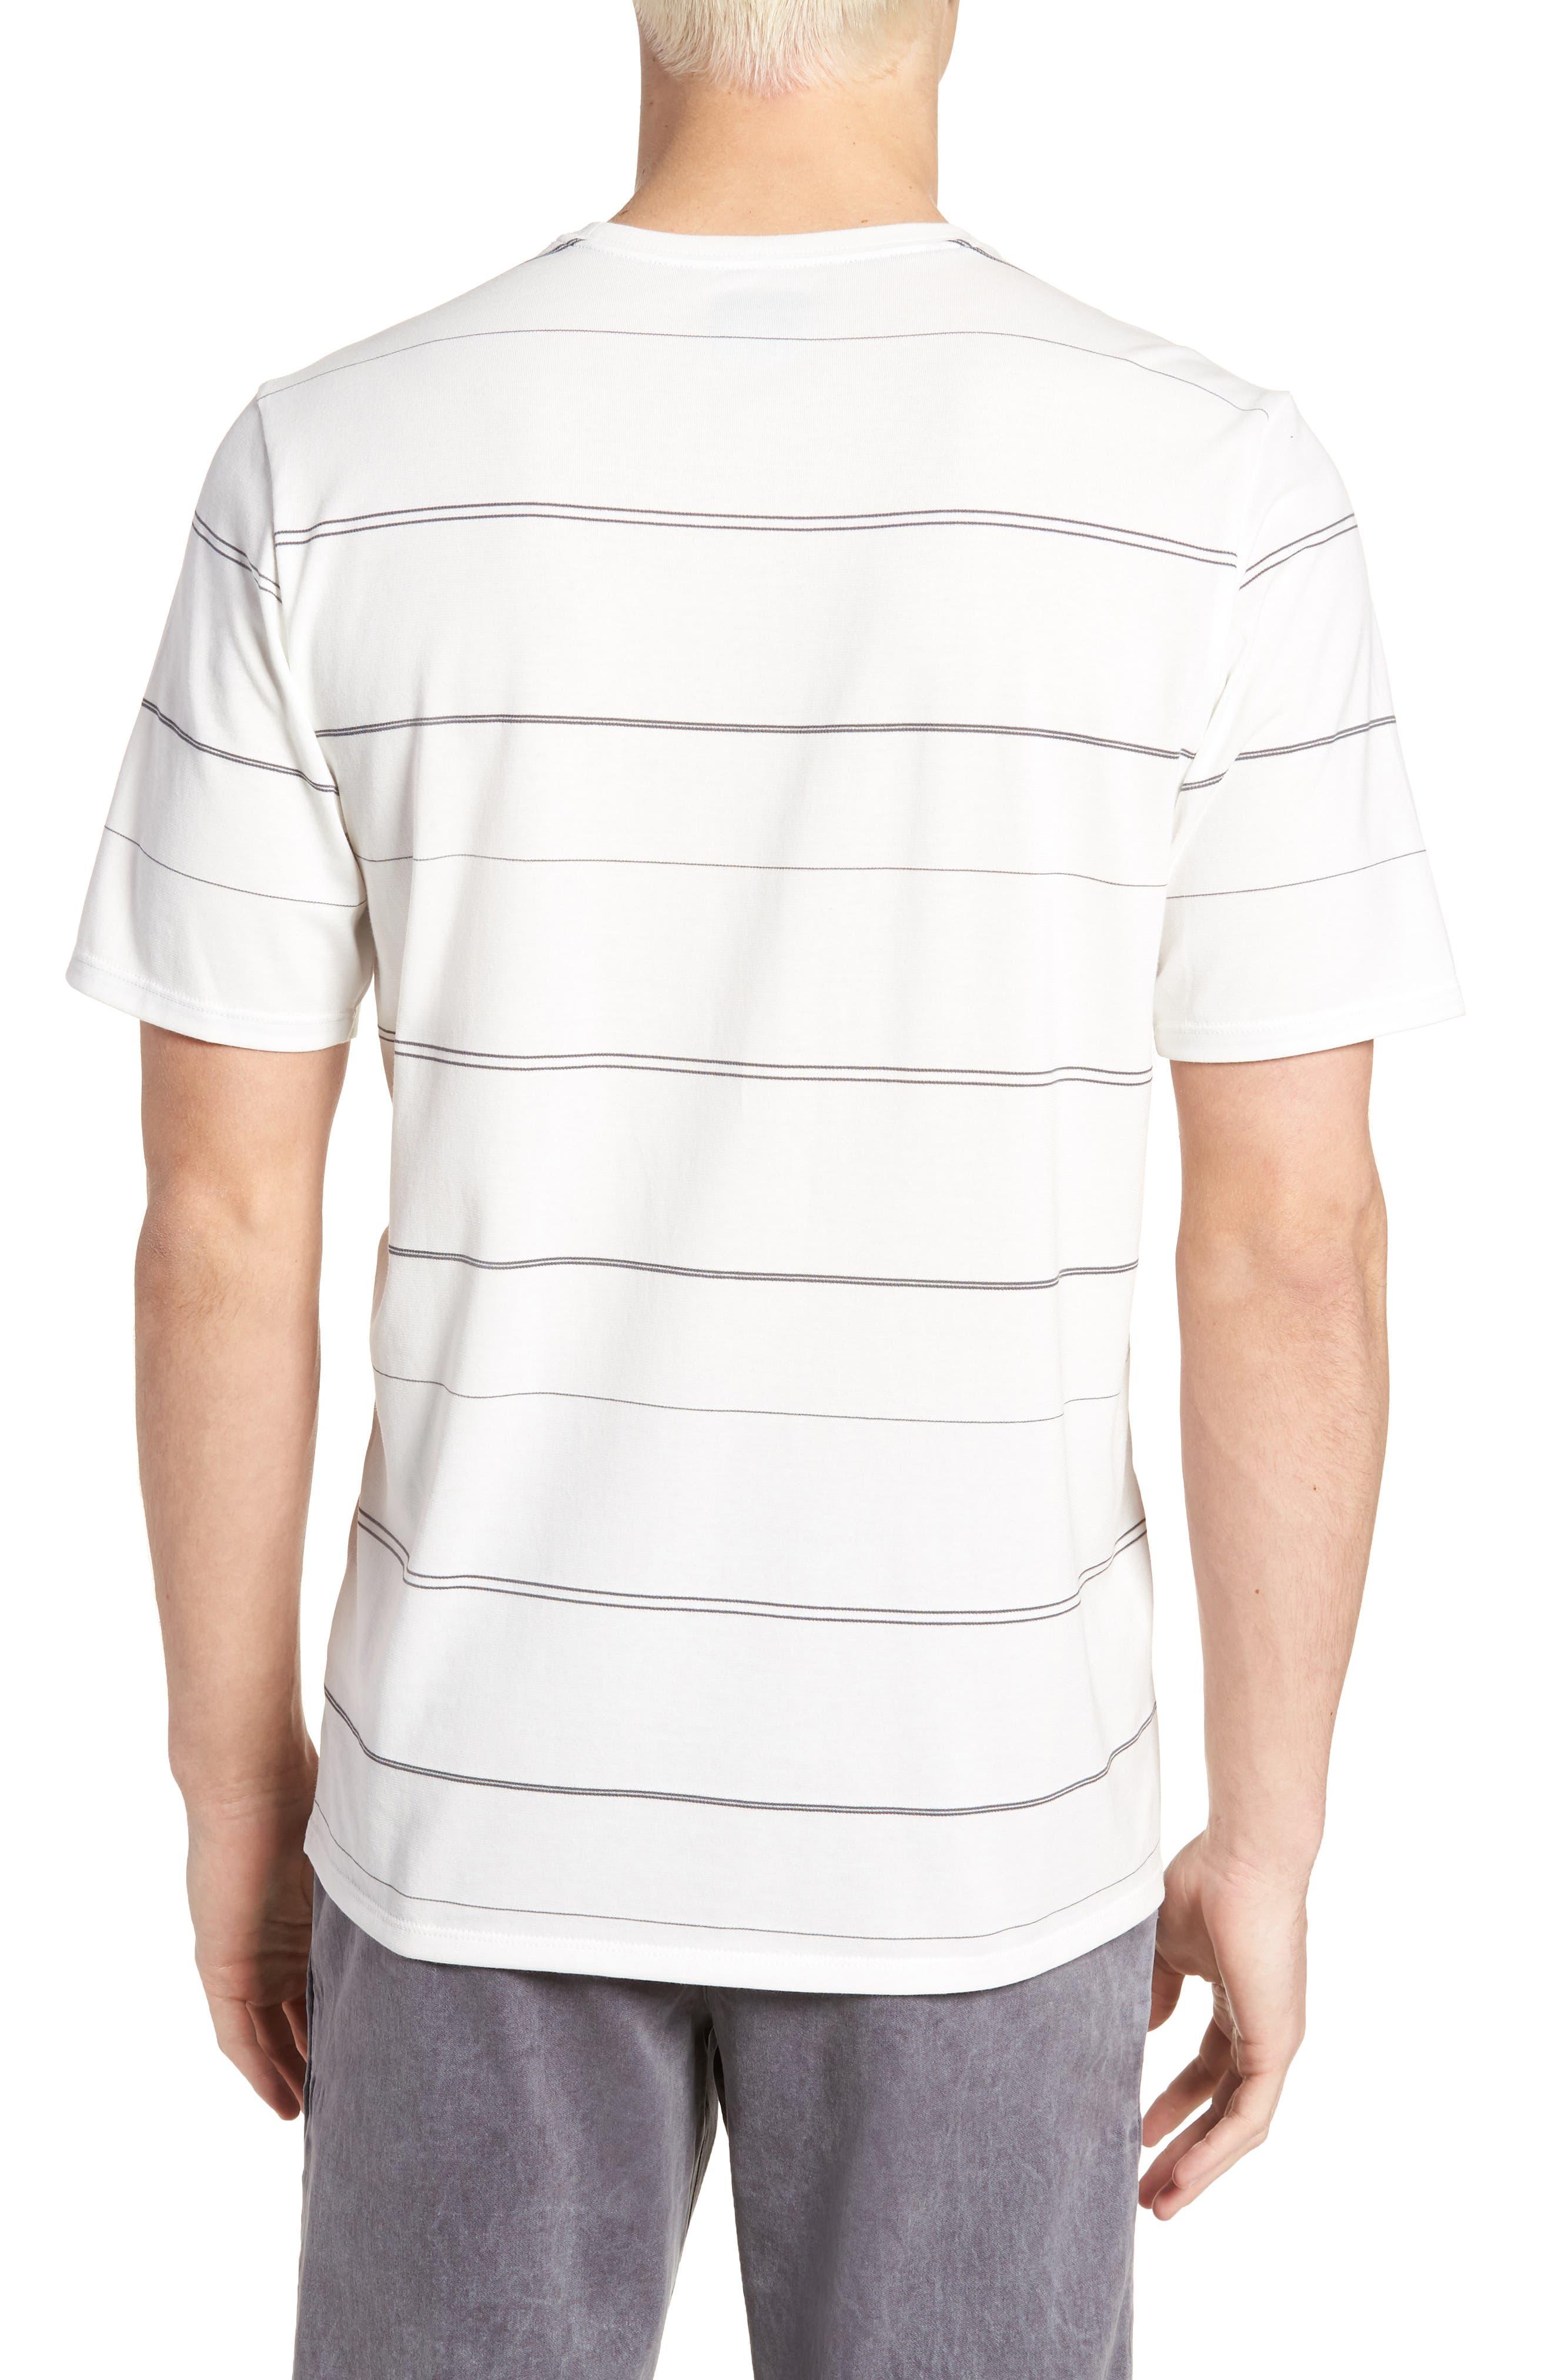 Alternate Image 2  - Hurley Dri-FIT New Wave T-Shirt